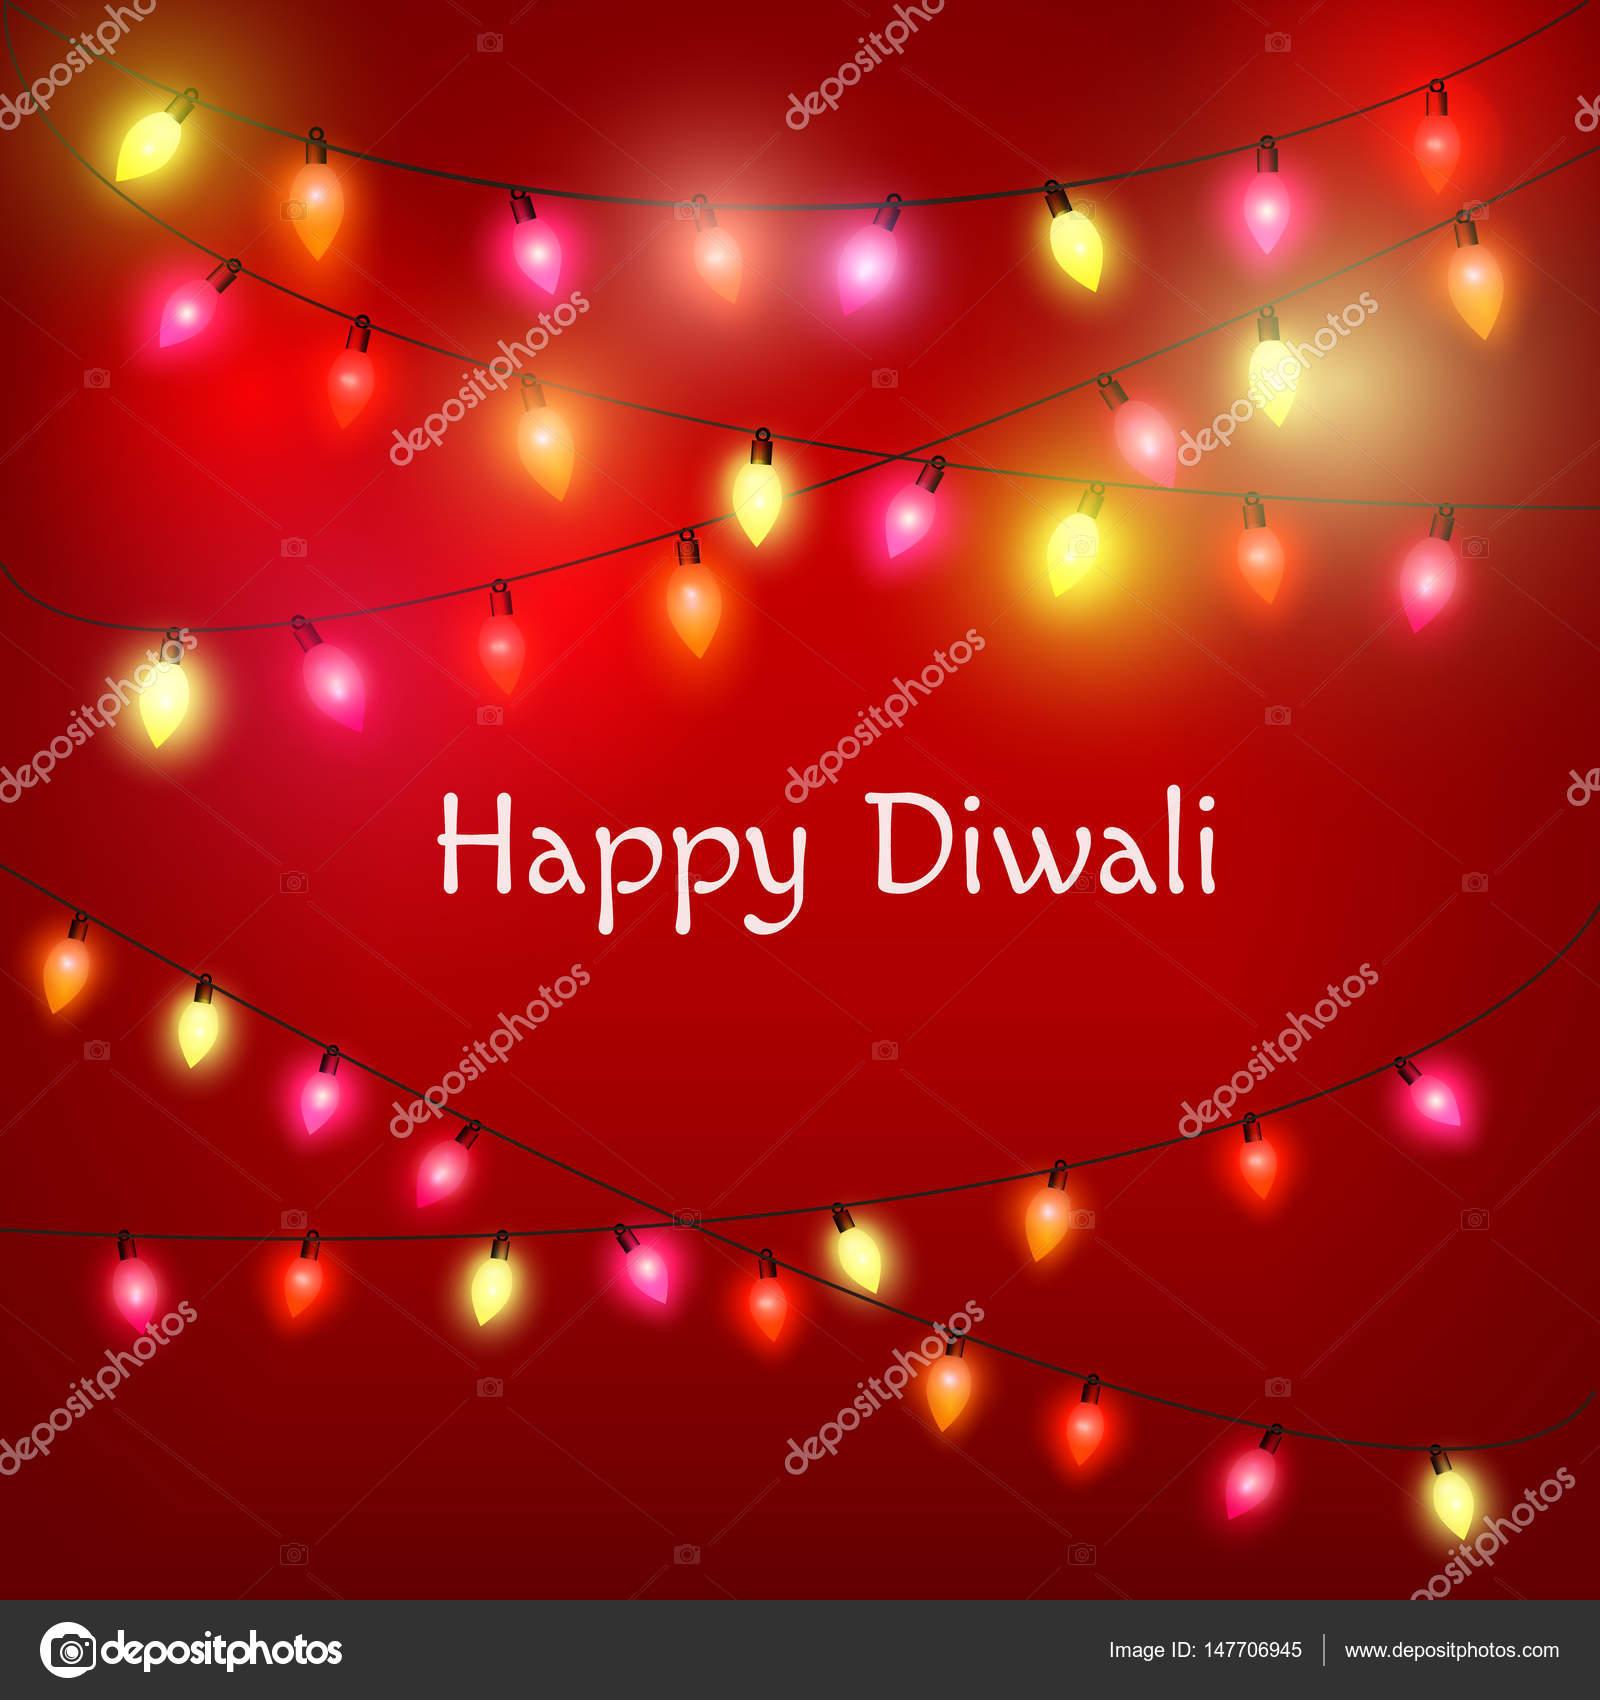 Happy diwali greeting card stock vector shipiolik 147706945 happy diwali greeting card stock vector m4hsunfo